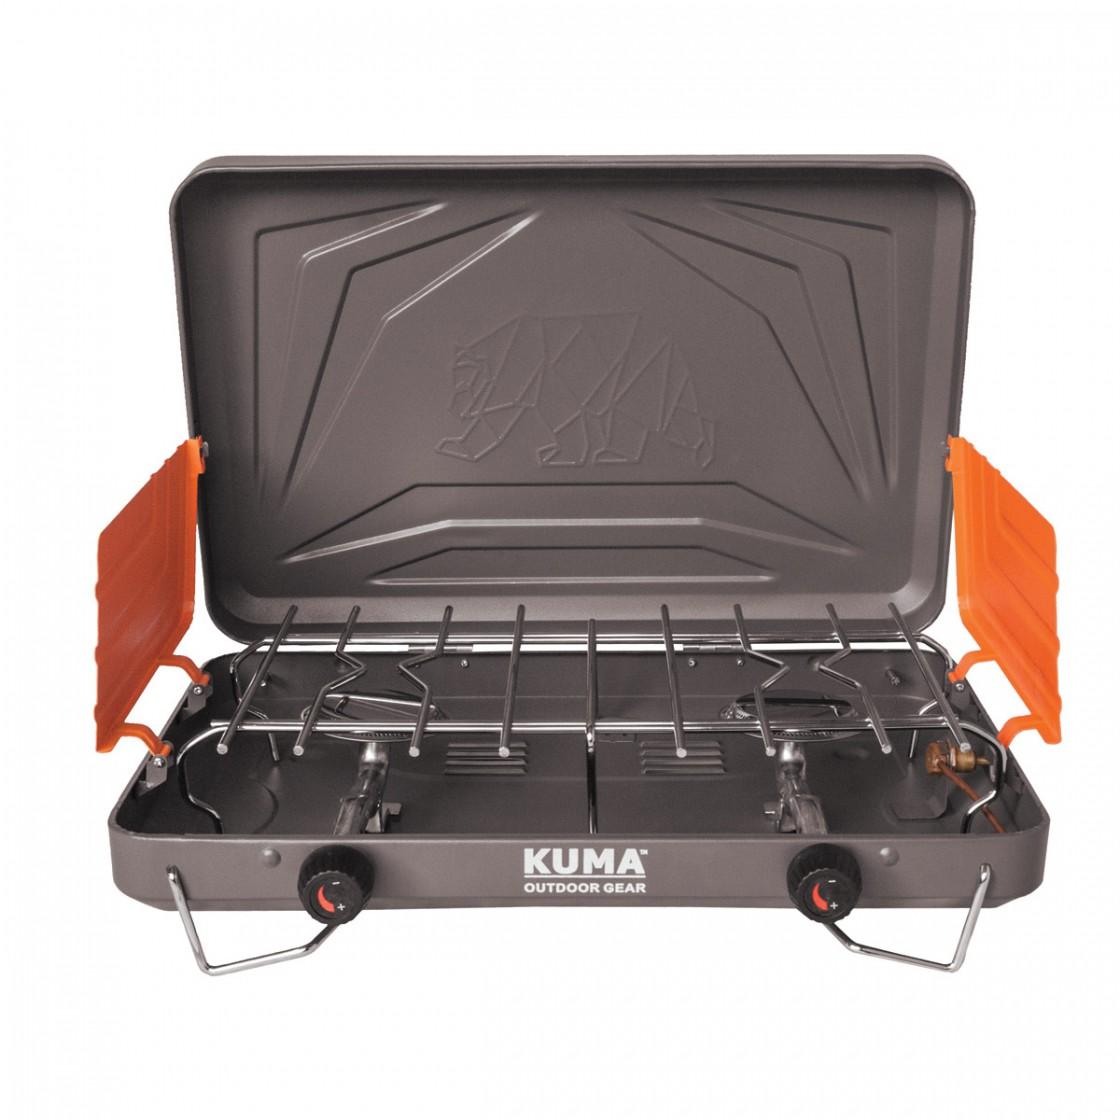 2 Burner Propane Stove Propane Products Kuma Outdoor Gear